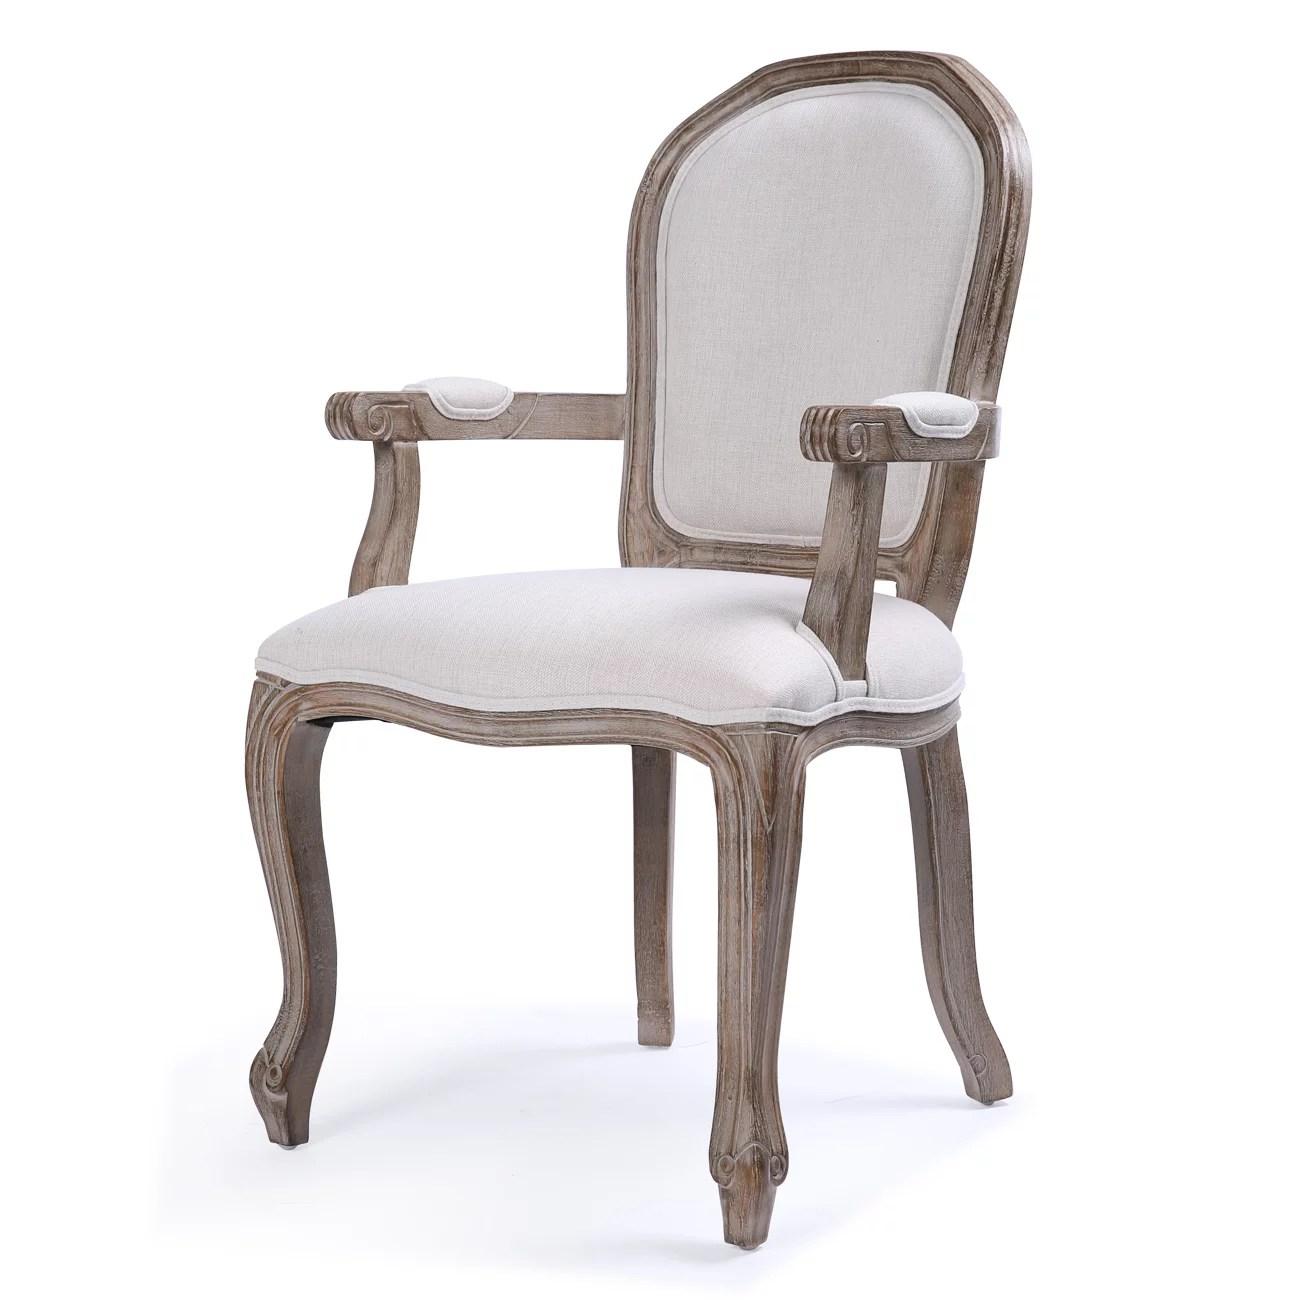 Padded Garden Chair